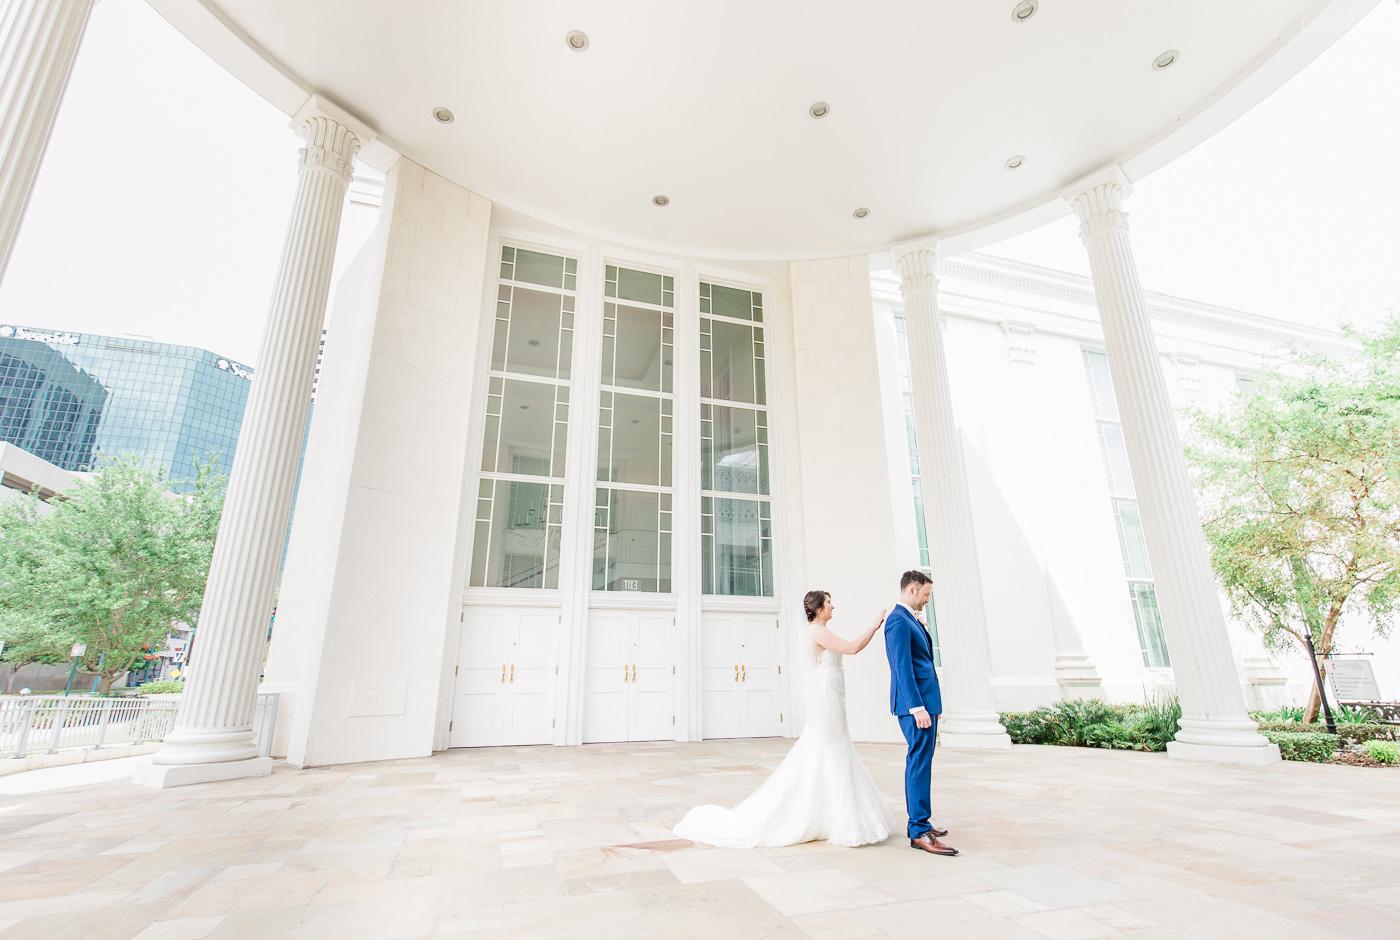 Downtown-Orlando-Wedding-5.jpg